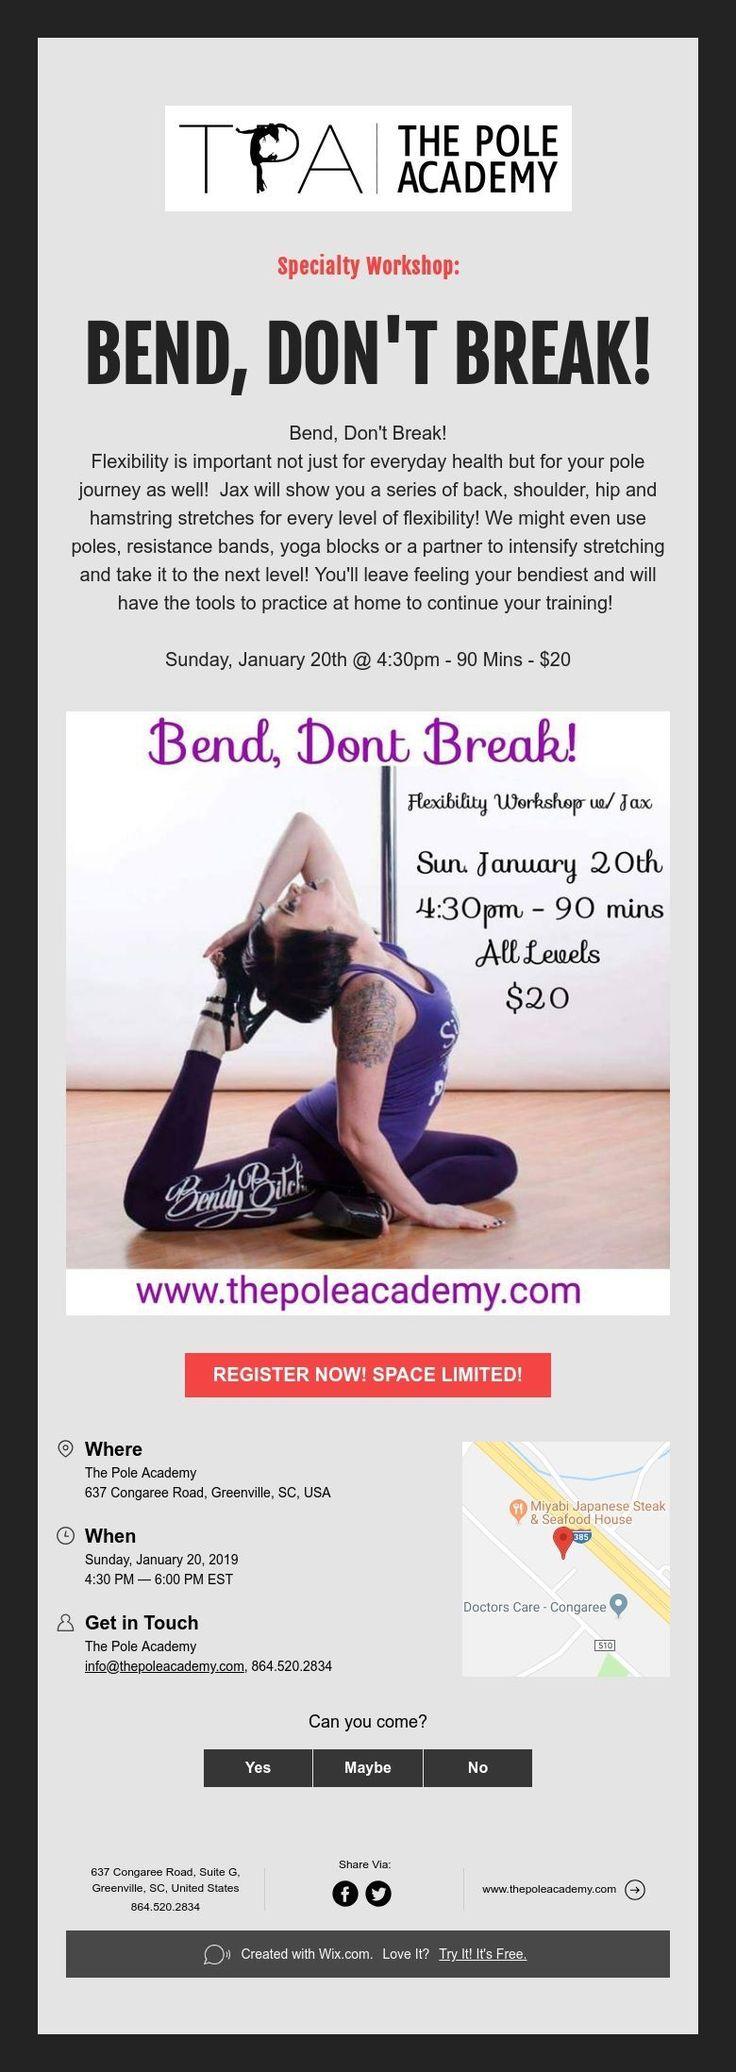 Specialty BEND, DON'T BREAK! Hamstring stretch